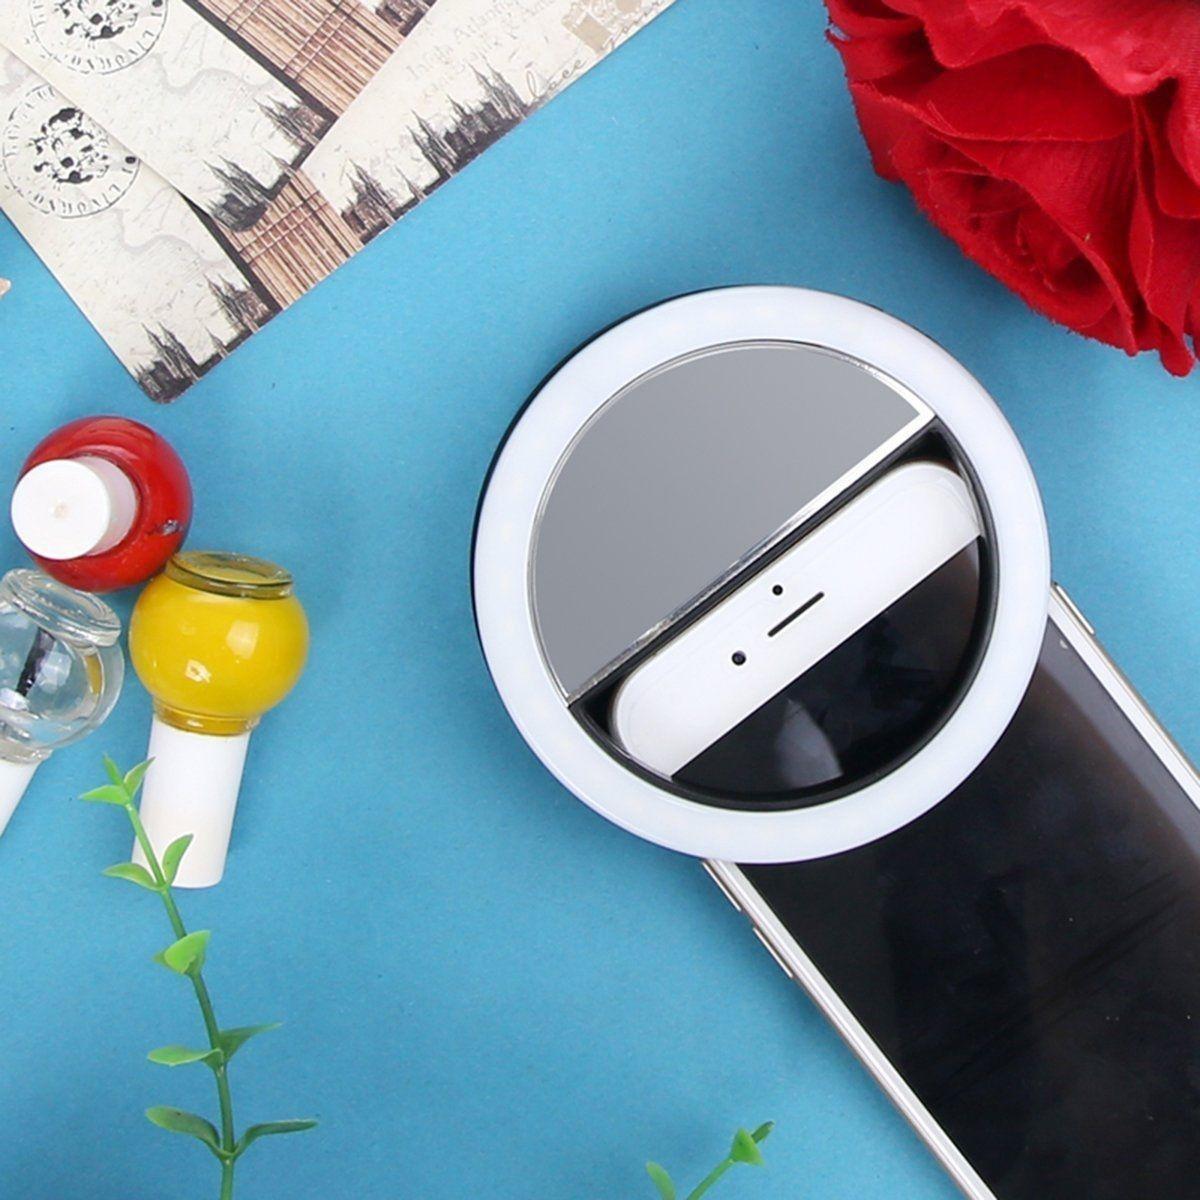 Селфи-кольцо Selfie Ring Light